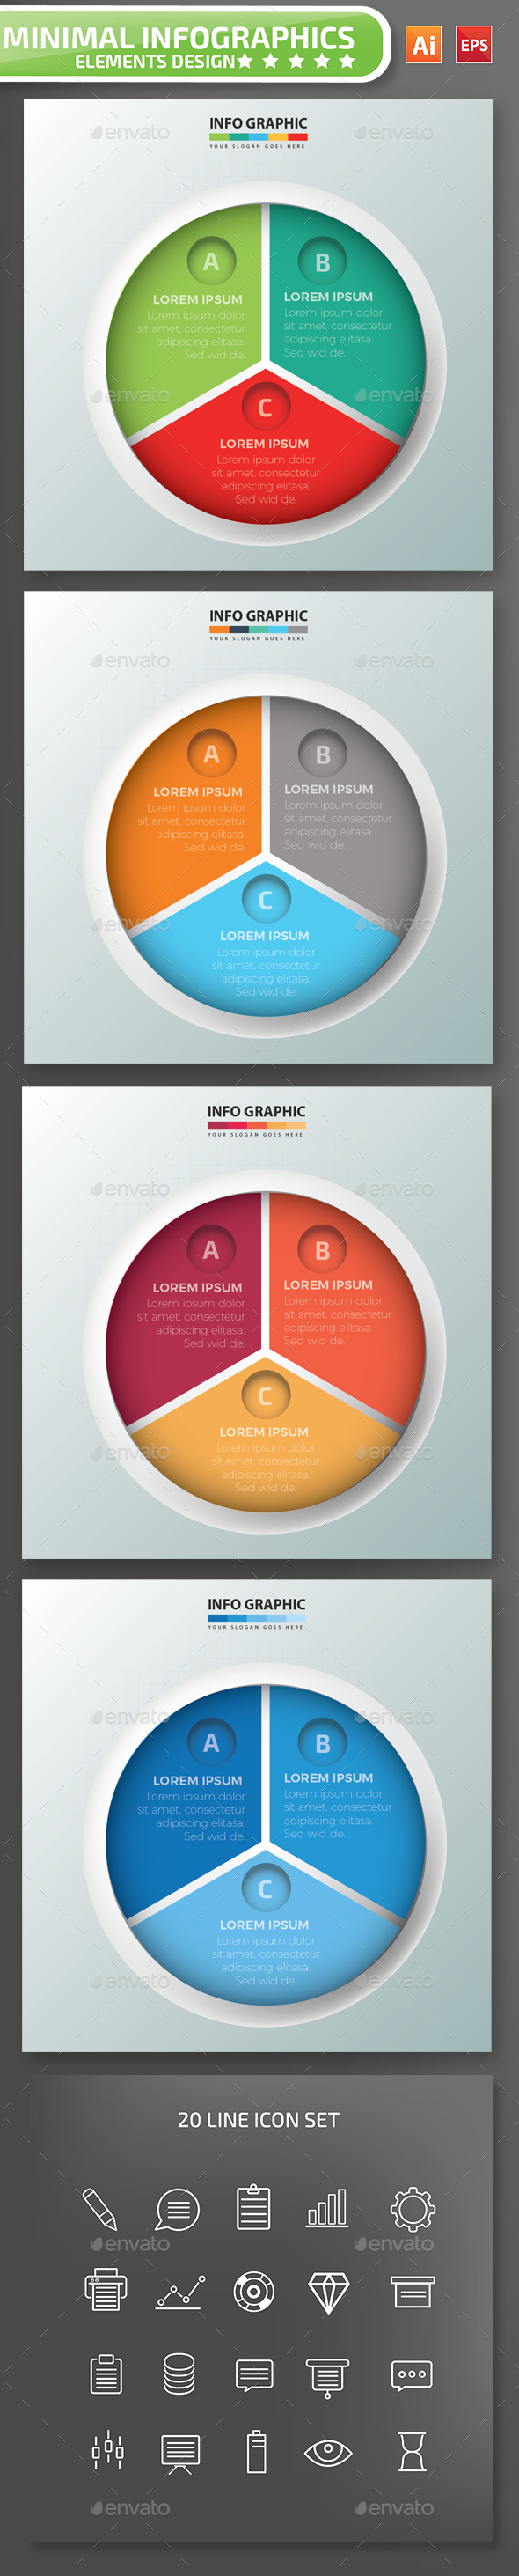 Minimal 3 Circle infographic Design